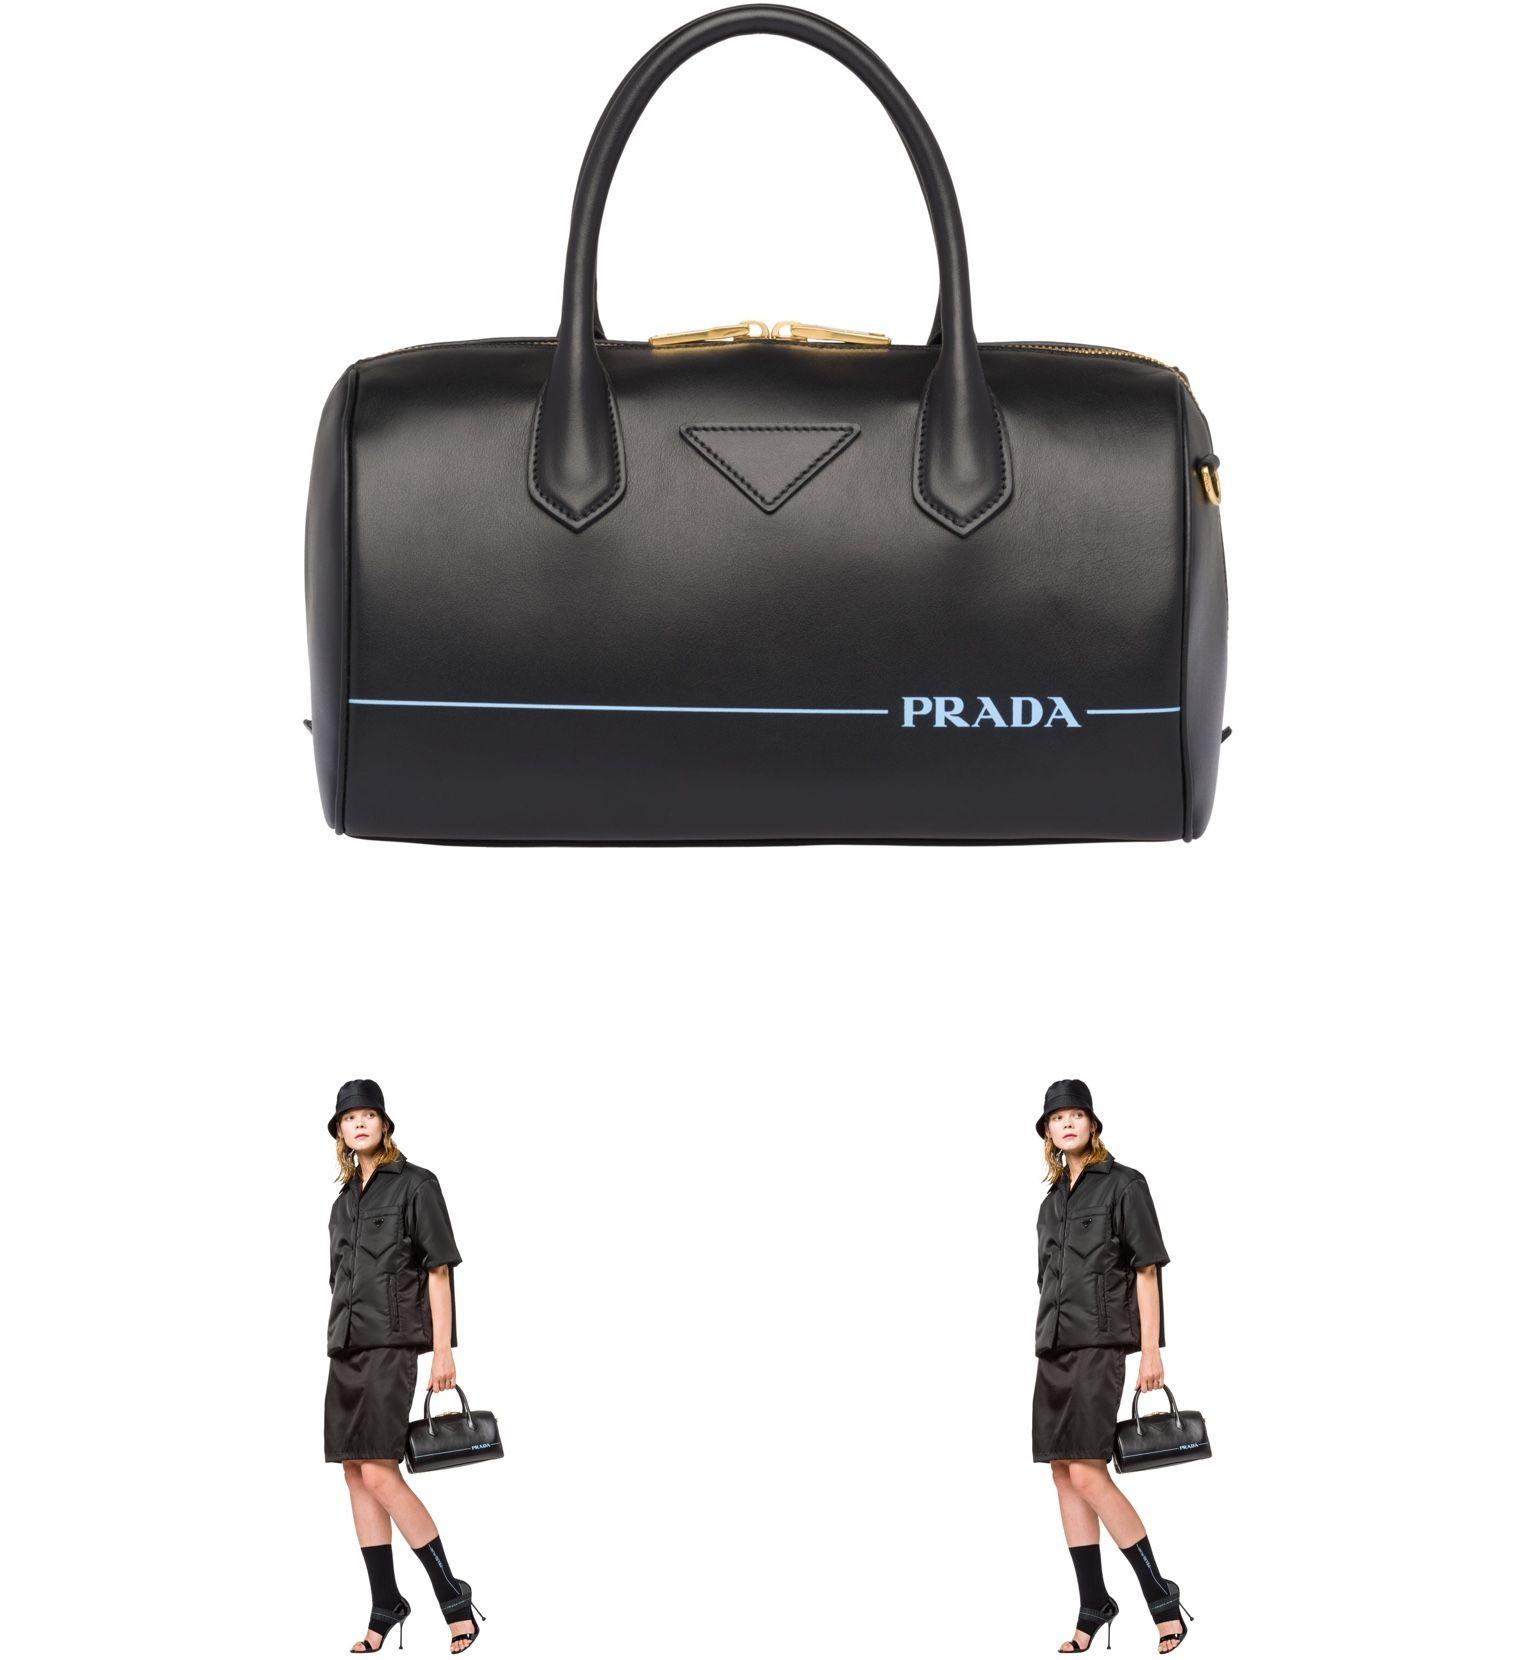 267fe4ebf6a3b4 FrenchEconomie™ Fall Fashion 2018 Purses and Handbags: The Prada Black  Mirage Leather Duffle